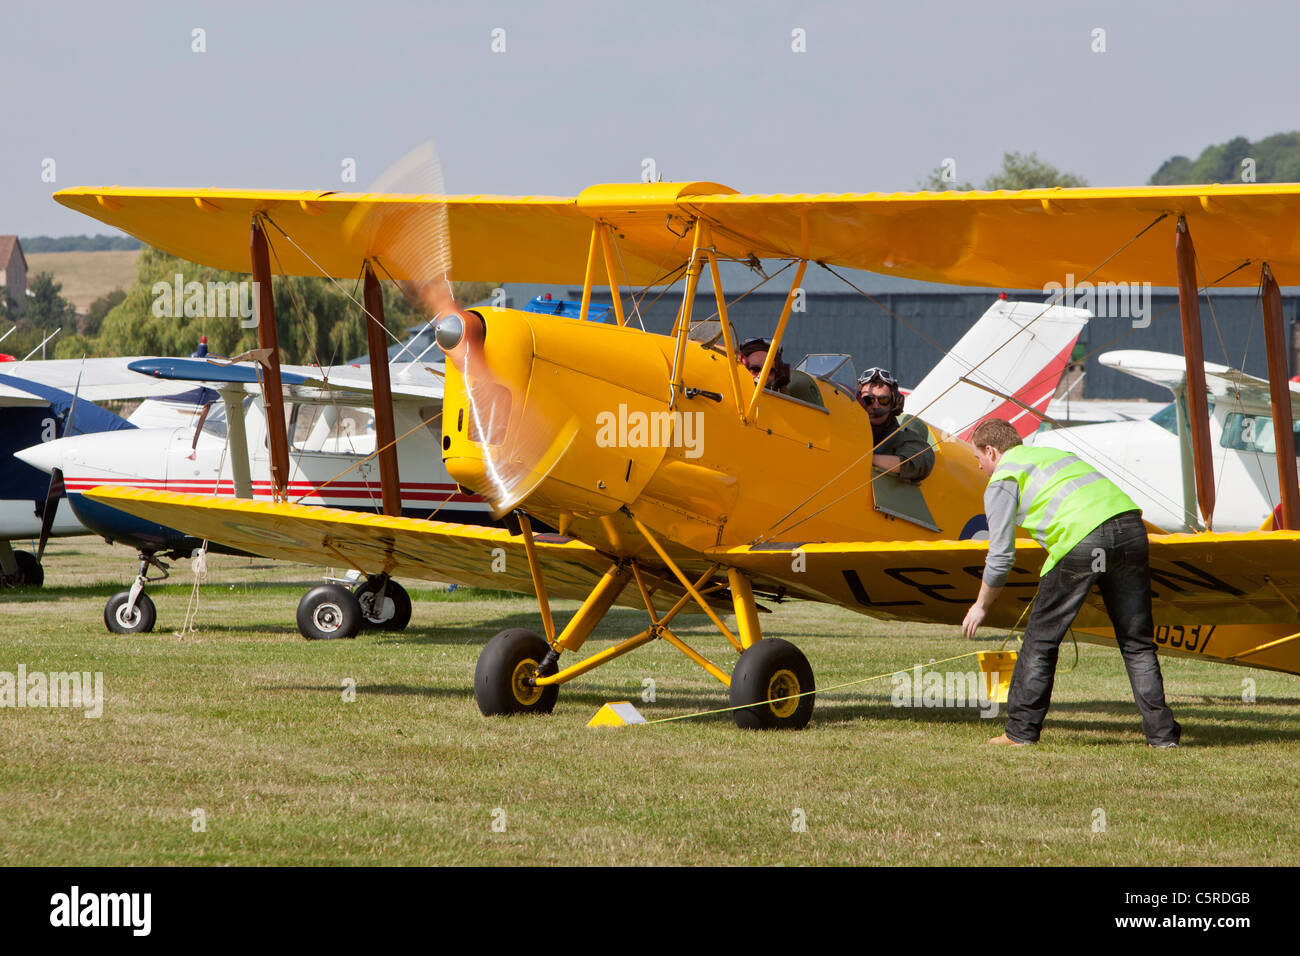 DH82 Tiger Moth biplane ready for take-off. Netherthorpe aerodrome, UK - Stock Image